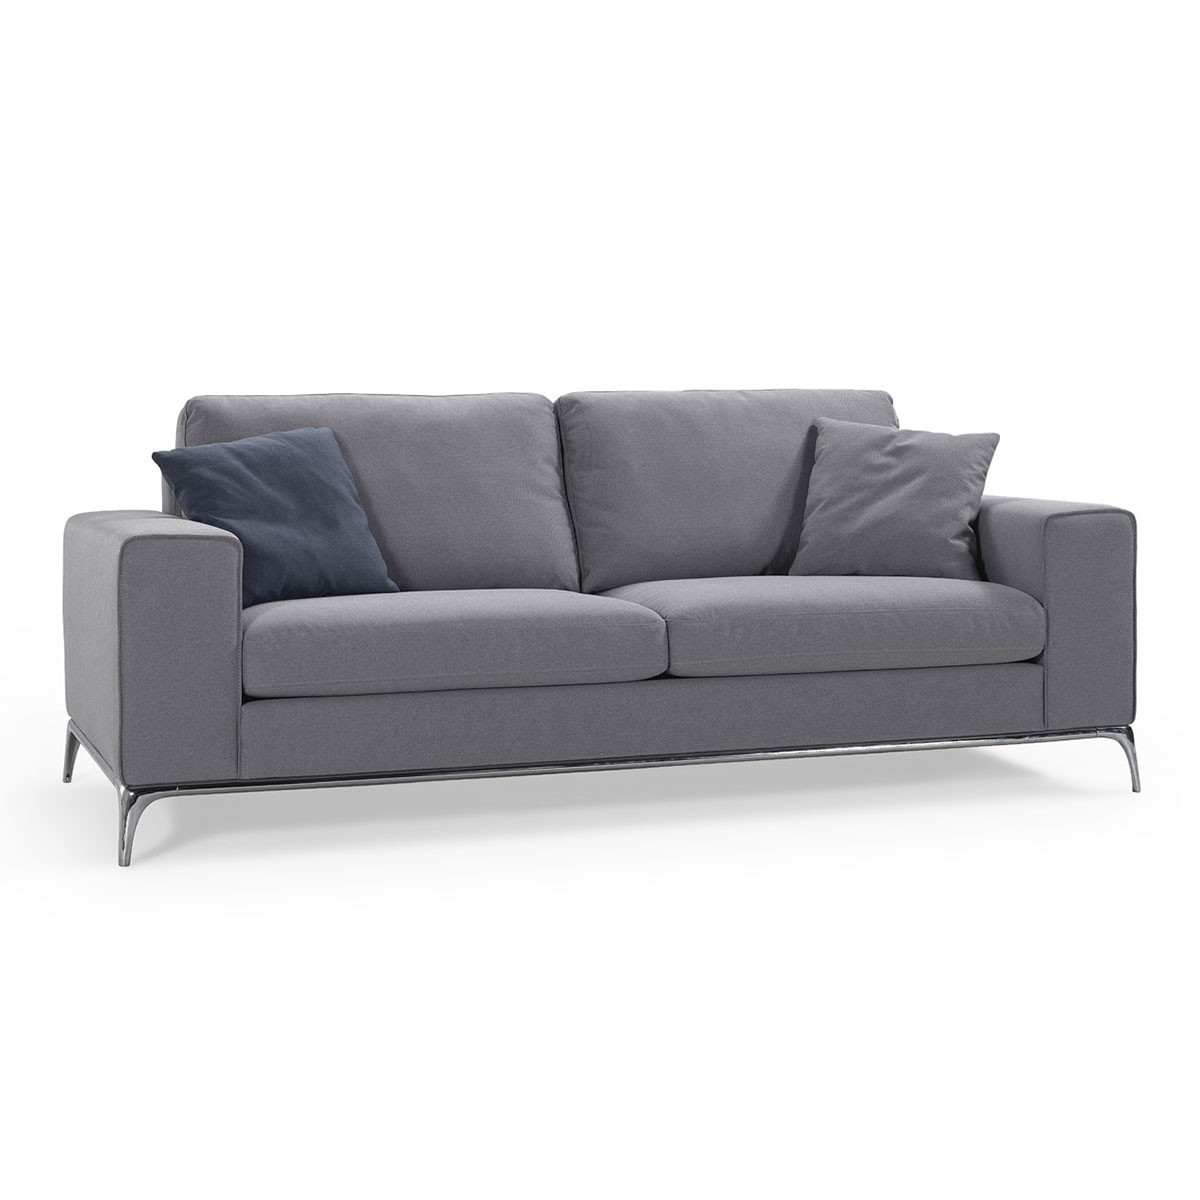 Fabric Loveseat Sofa with Pillows - Grey (BO-438)